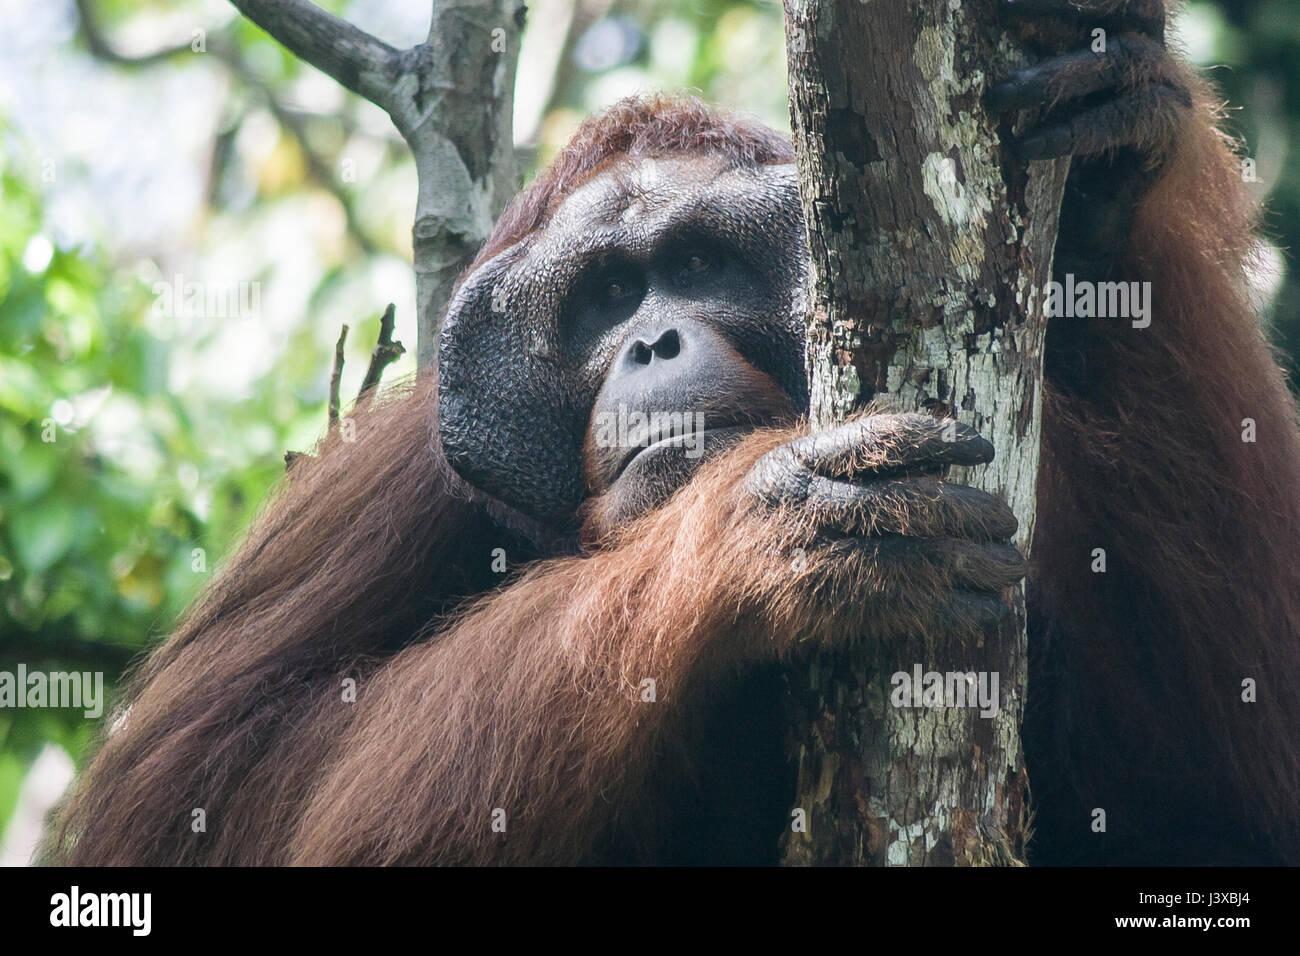 Critically endangered Bornean orangutan (Pongo pygmaeus). Mature males have the characteristic cheek pads. - Stock Image